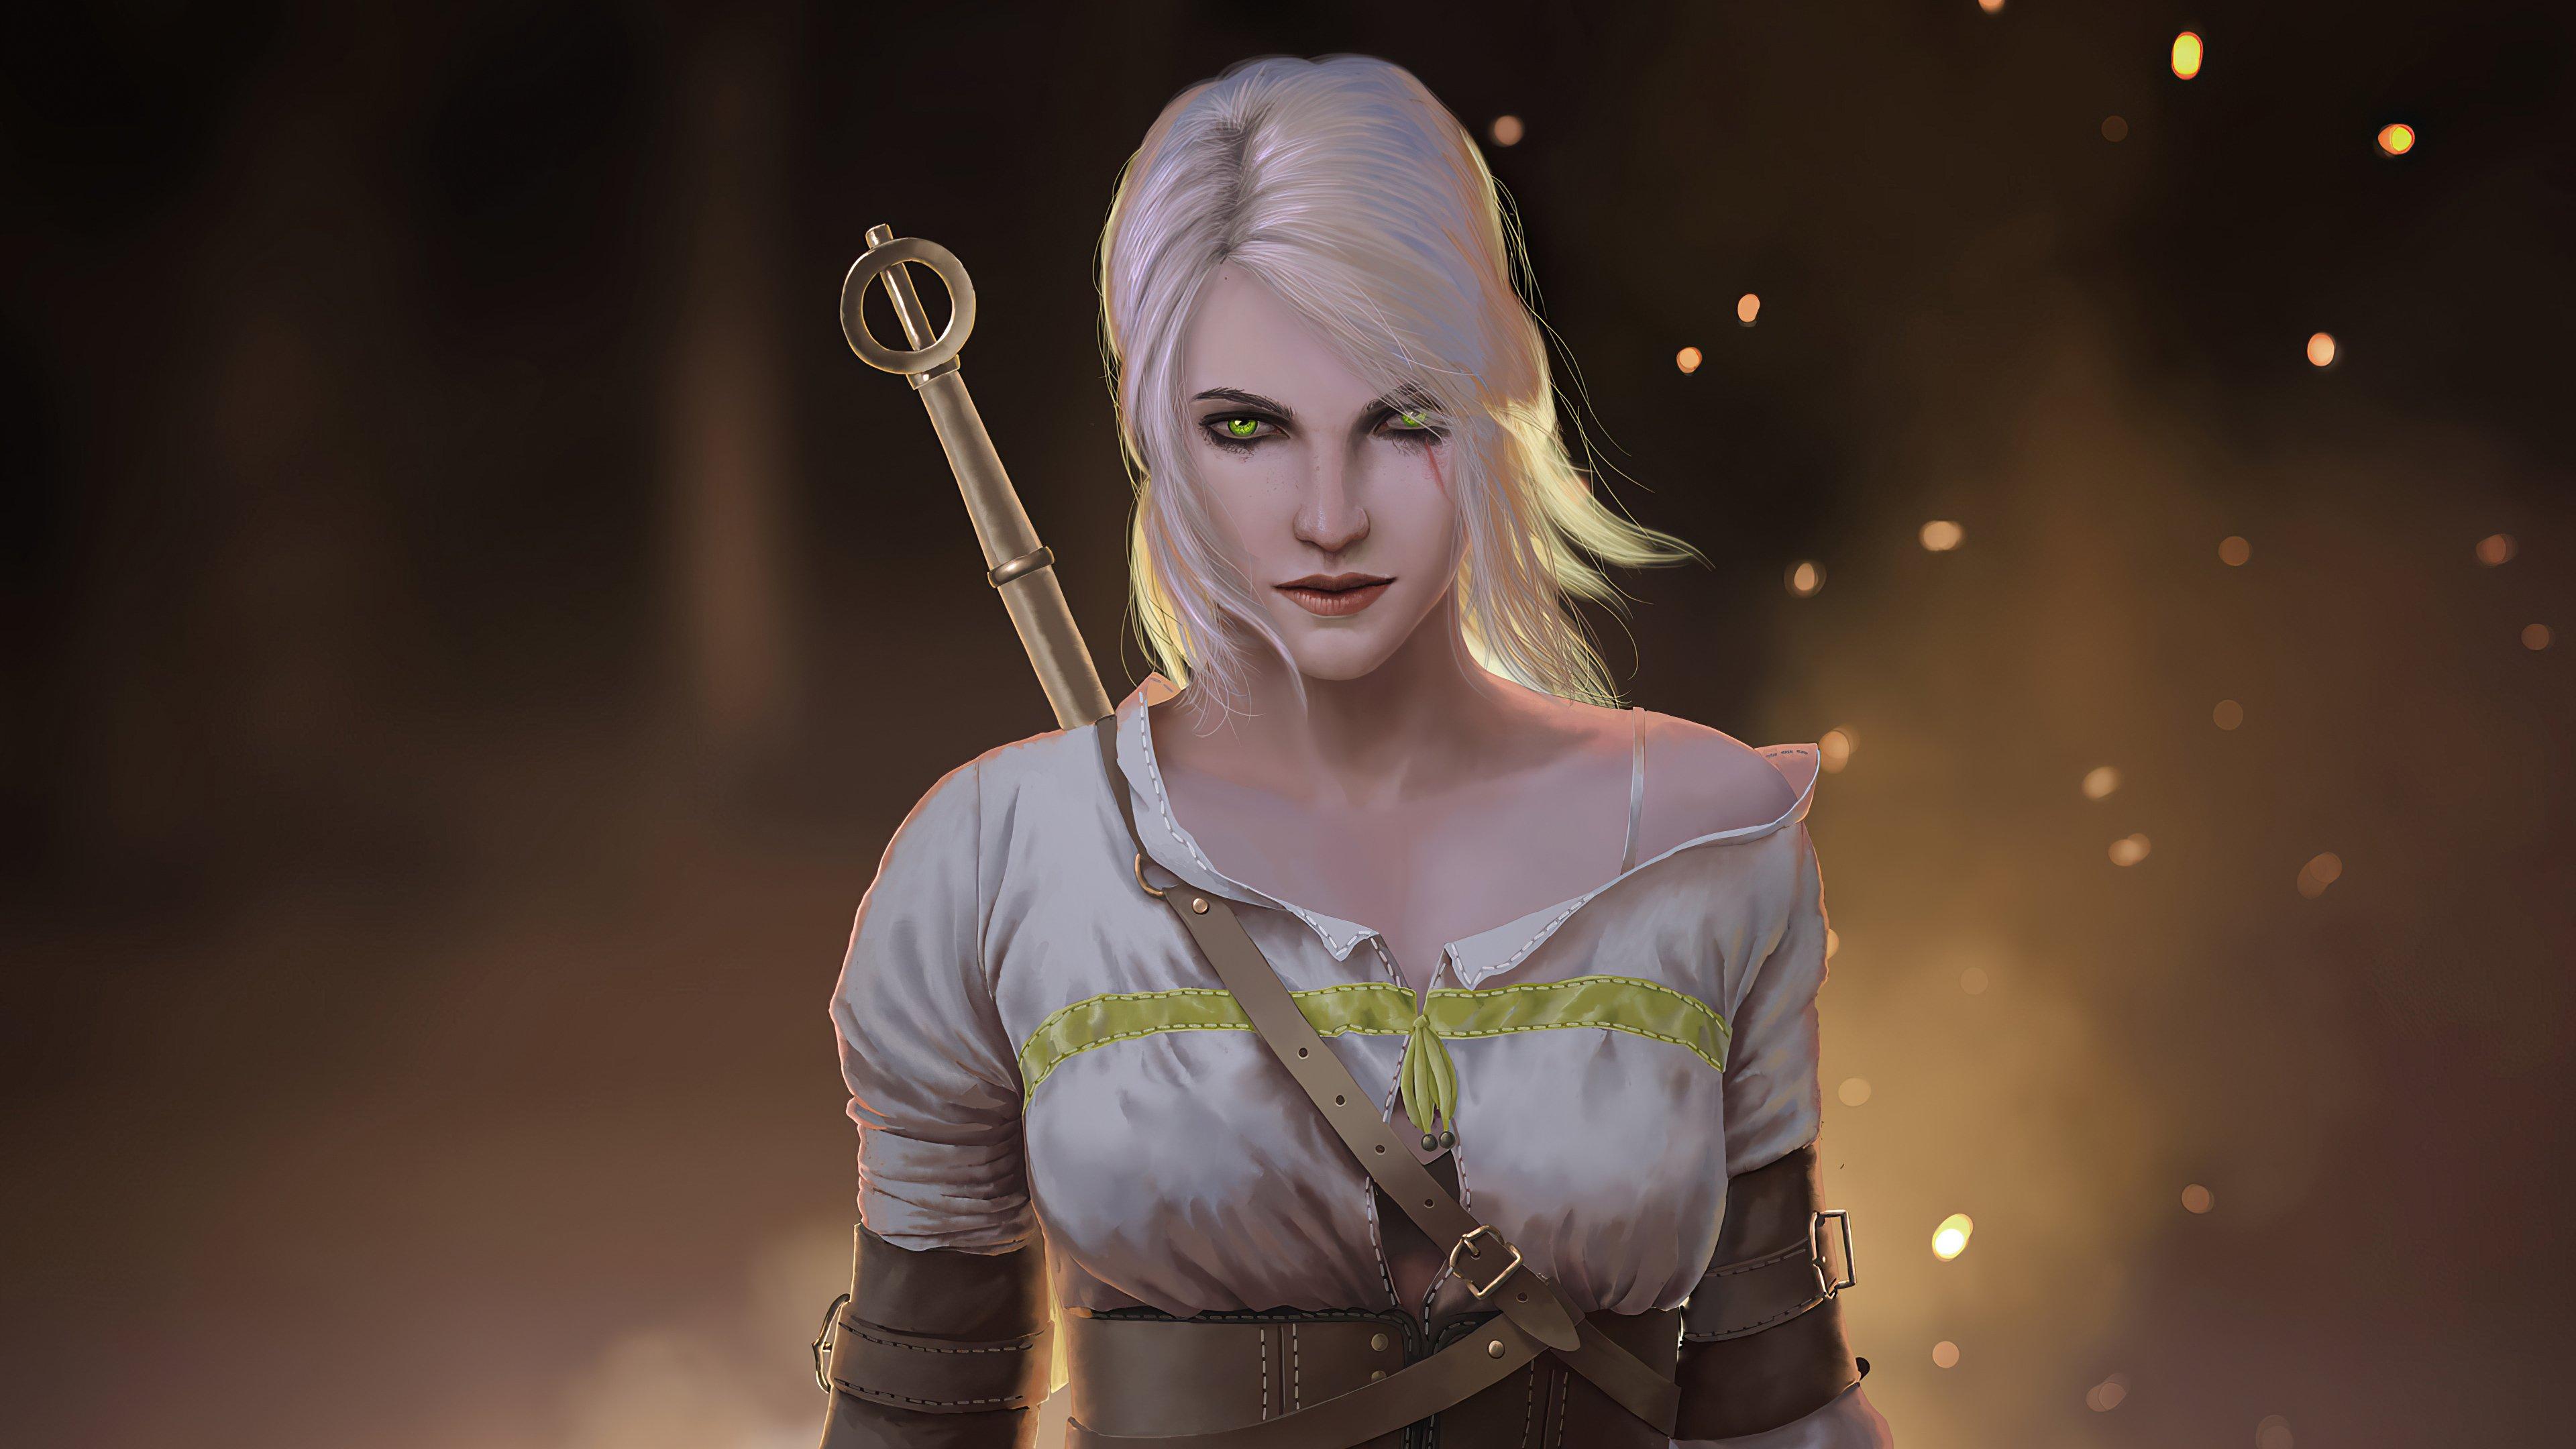 Fondos de pantalla Ciri personaje de The Witcher Fanart